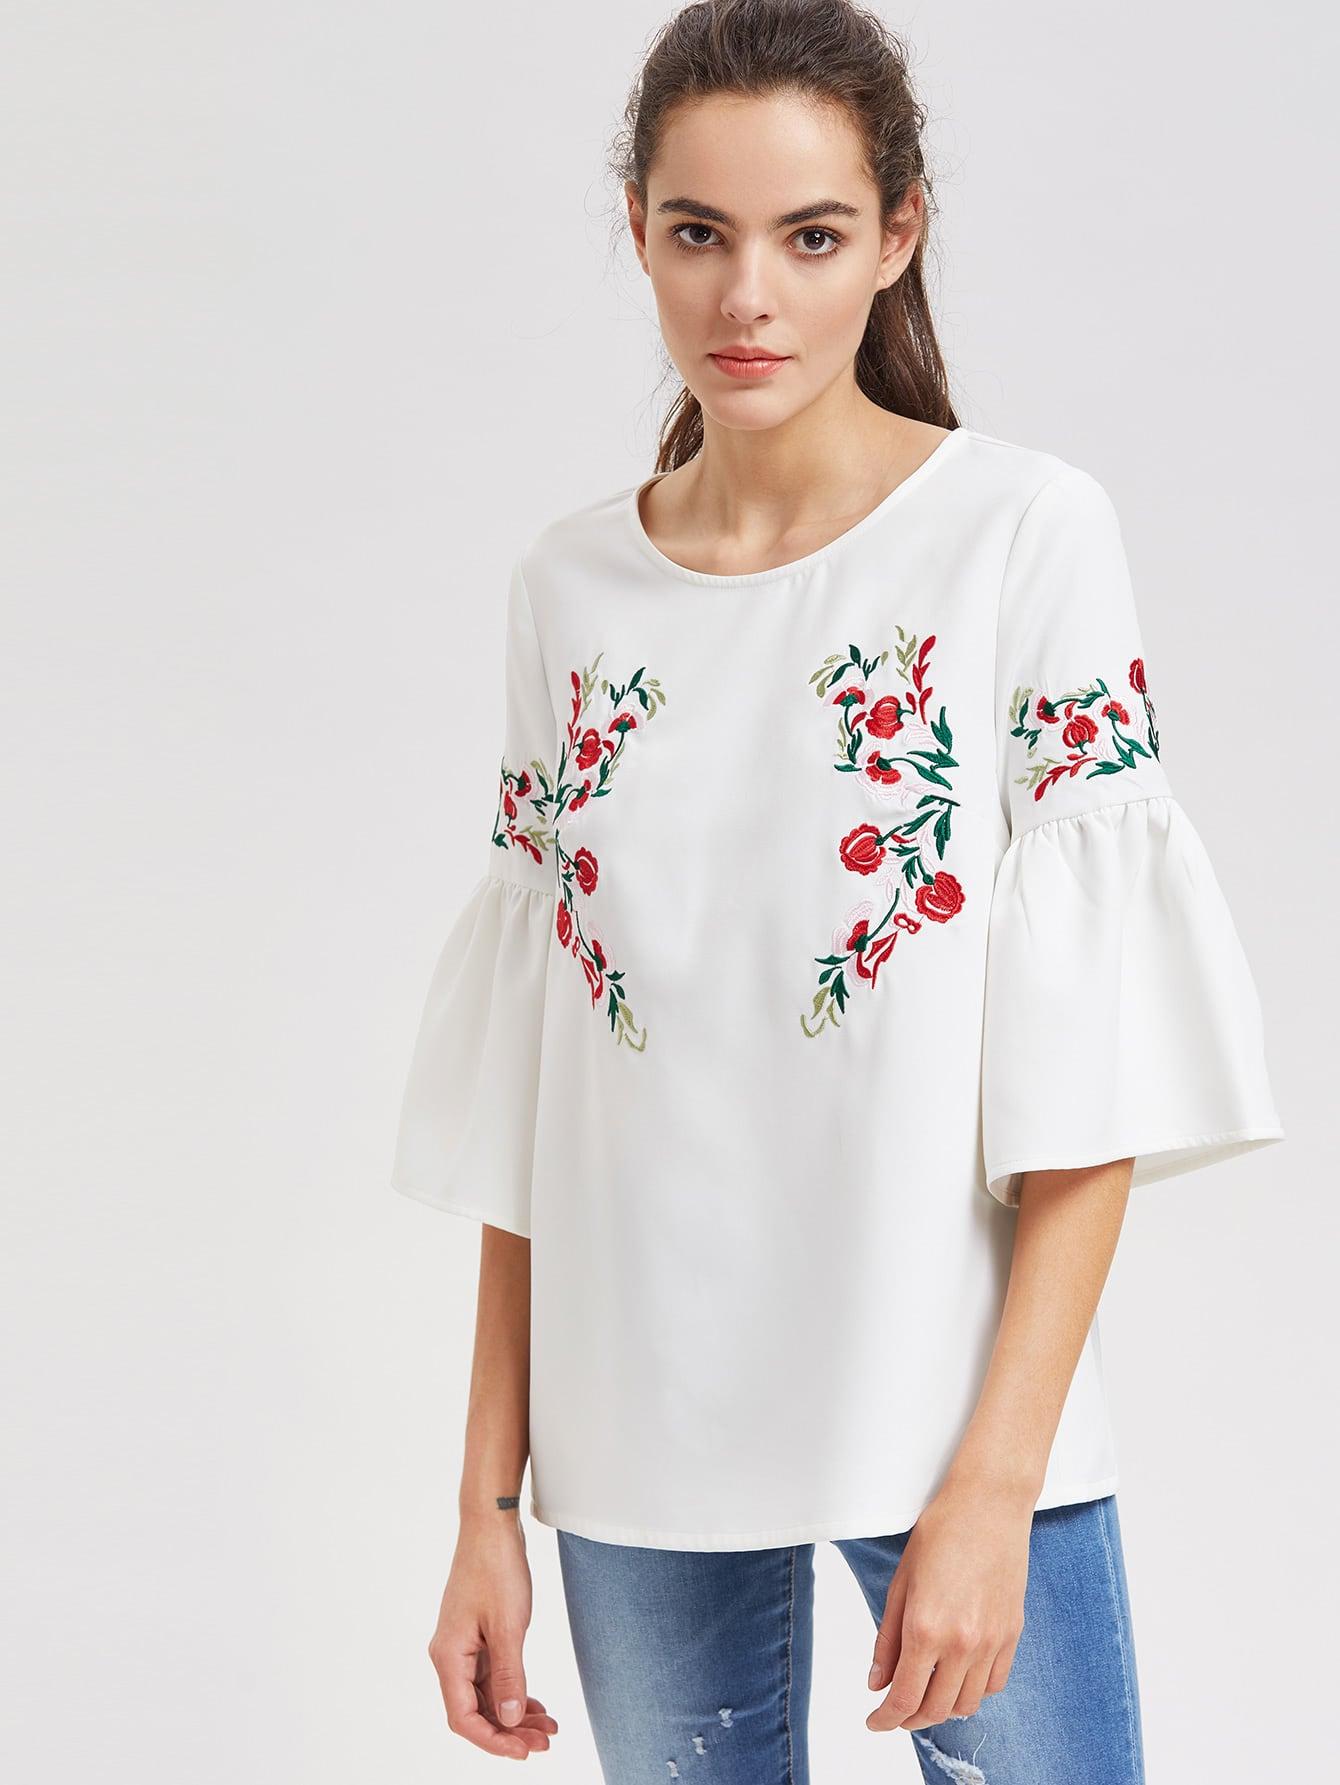 blouse170328711_2